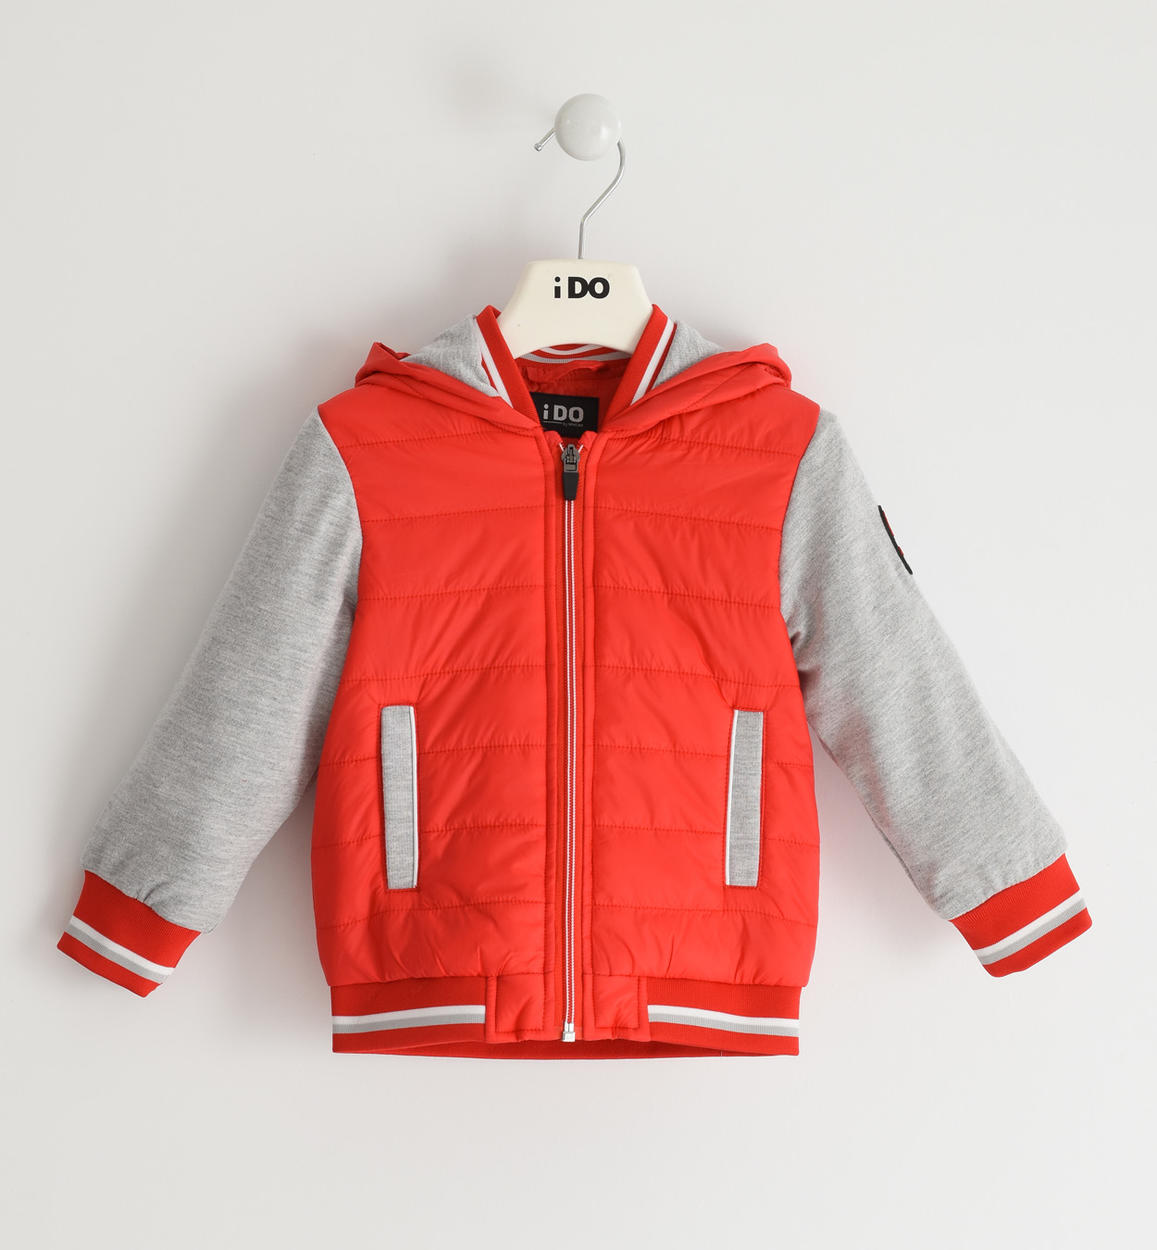 piros átmeneti kabát fiú